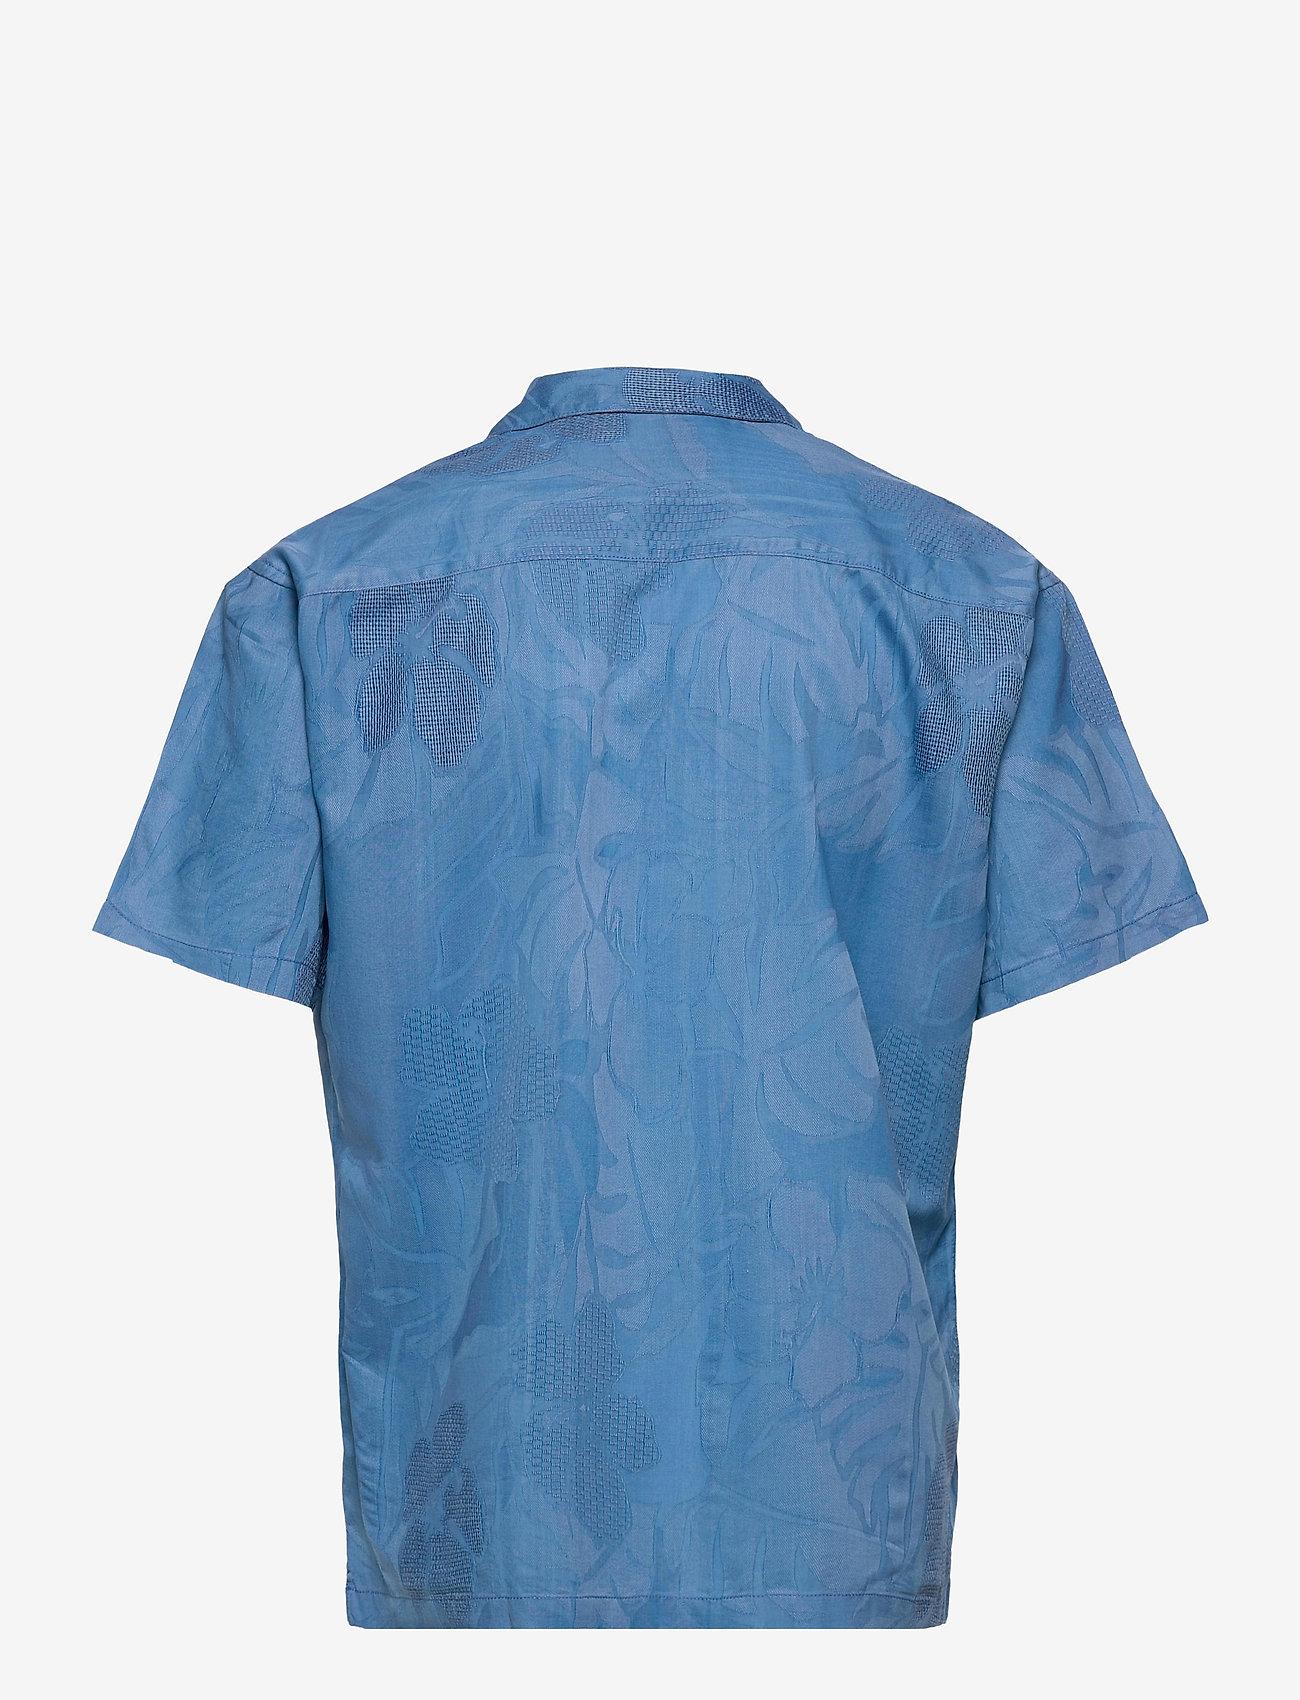 Jack & Jones - JPRBLUCOOPER RESORT SHIRT S/S RELAX - rutiga skjortor - denim blue - 1